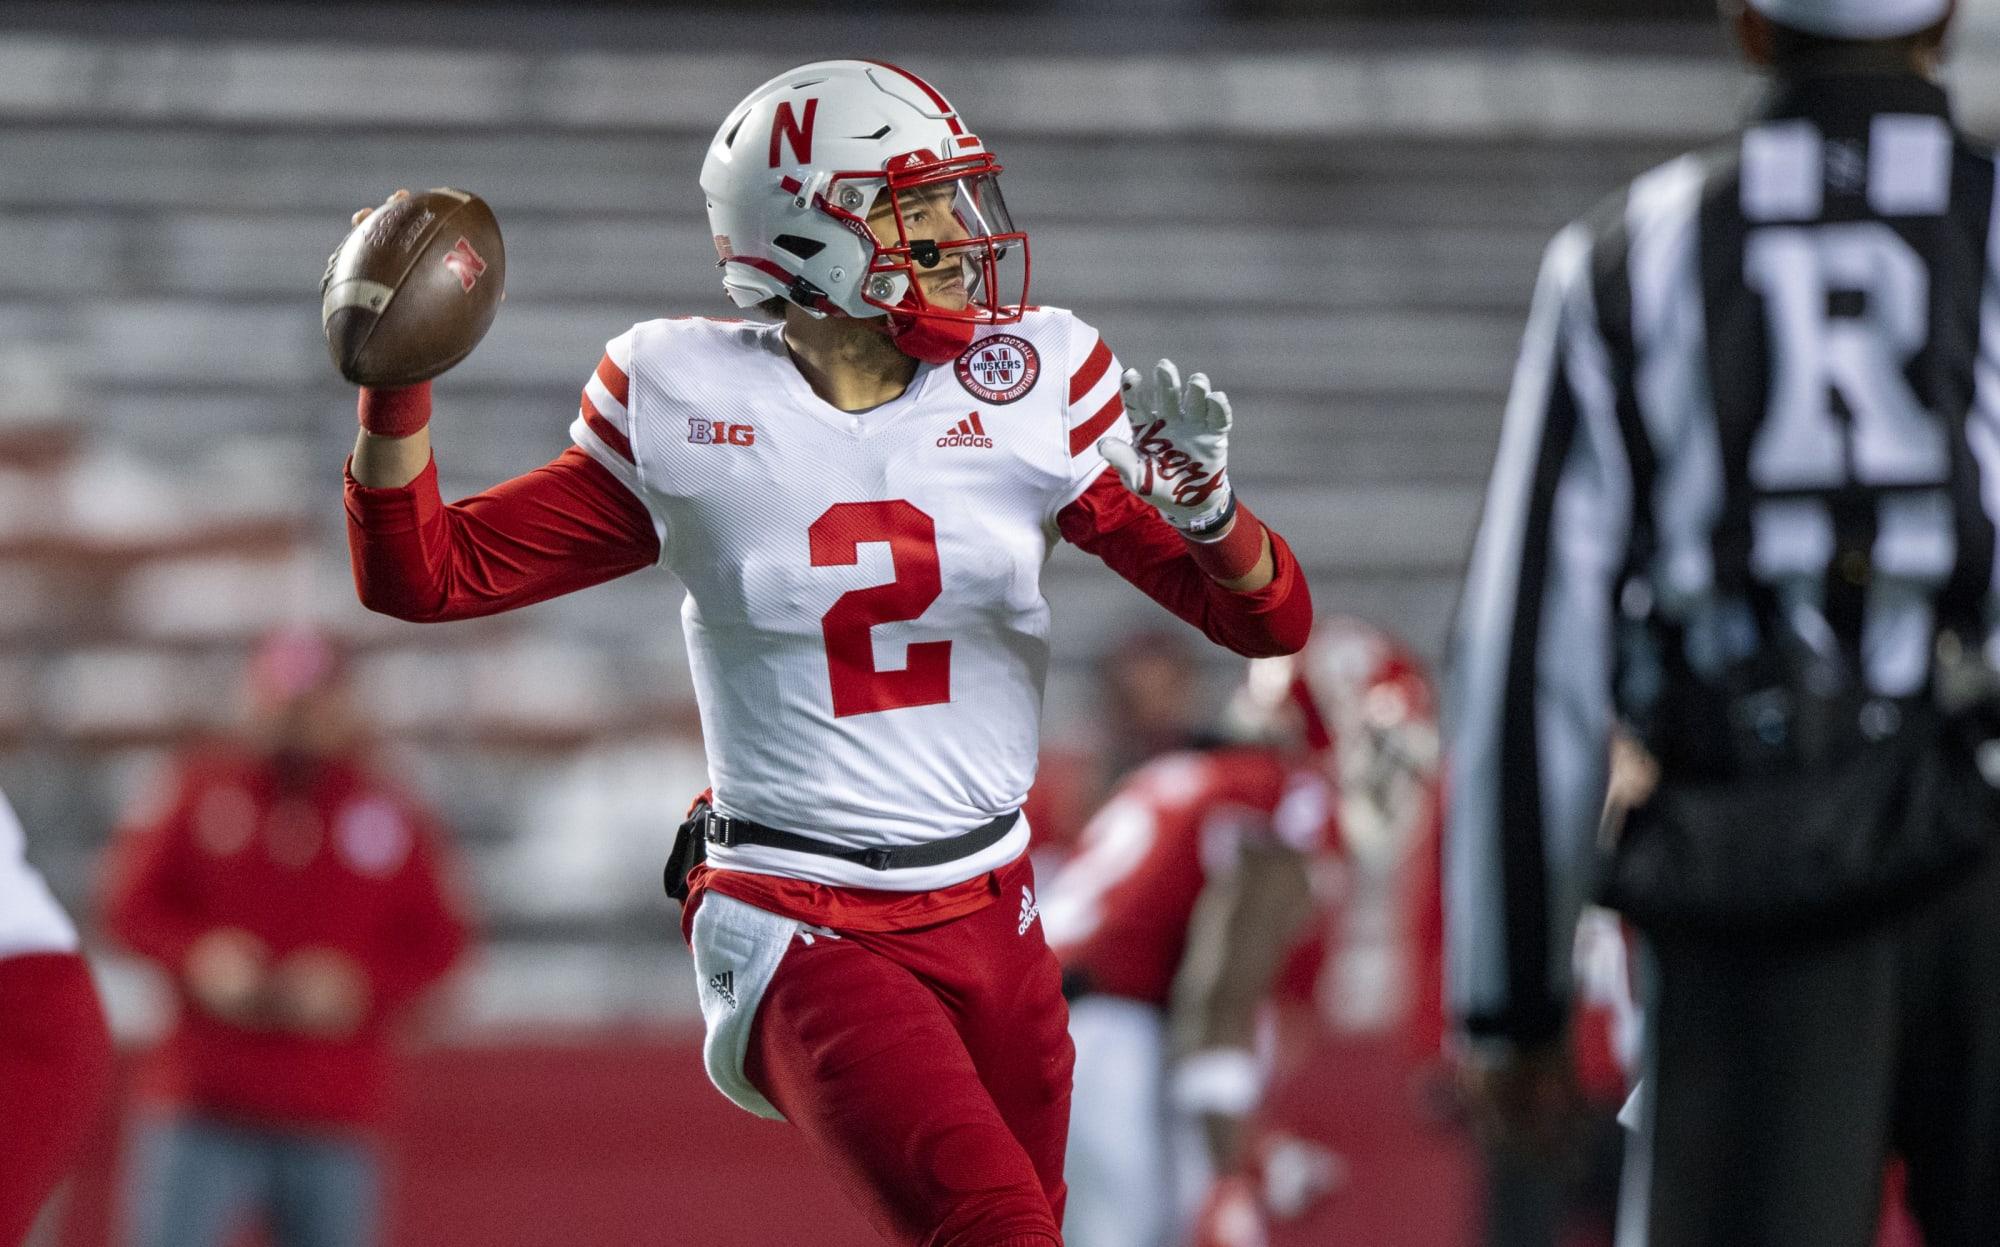 Nebraska Football: Adrian Martinez needs to be on short leash in 2021